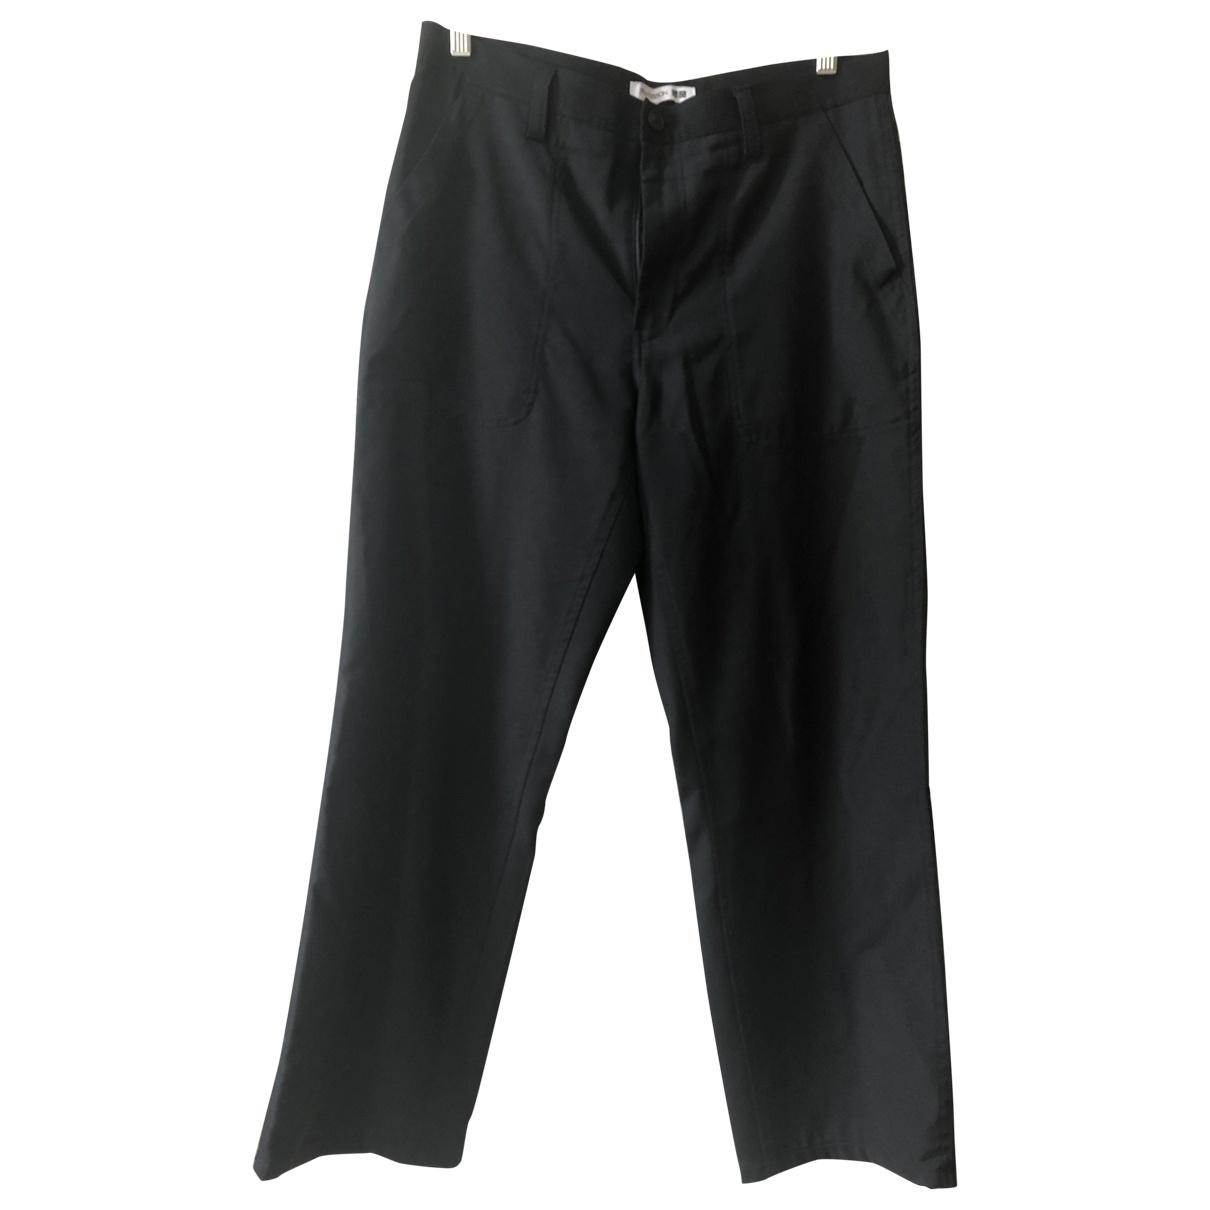 Uniqlo \N Black Wool Trousers for Men L International